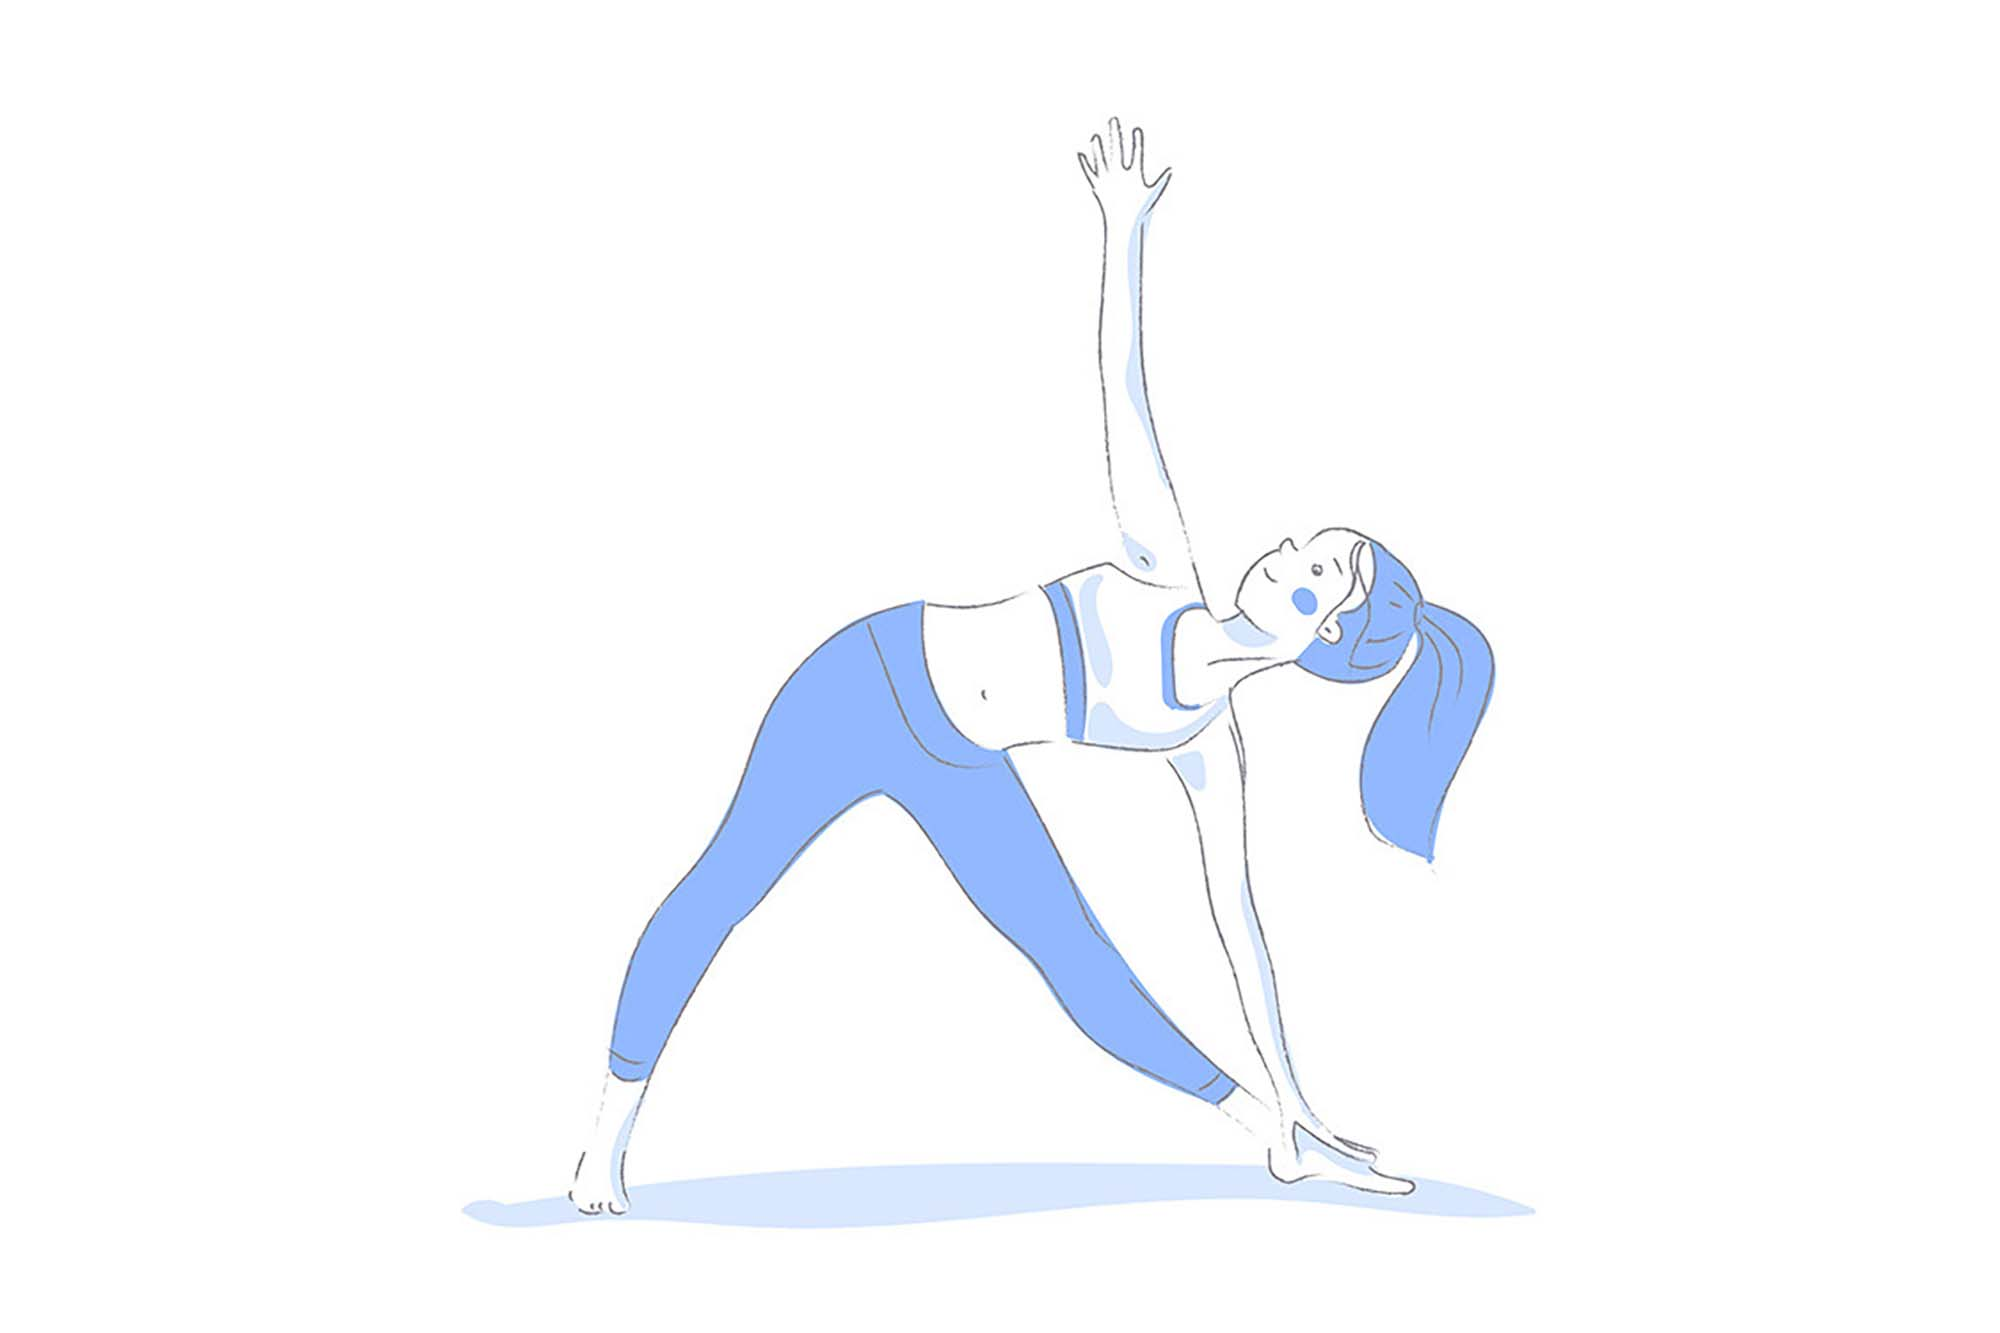 Yoga Poses Illustrations 1